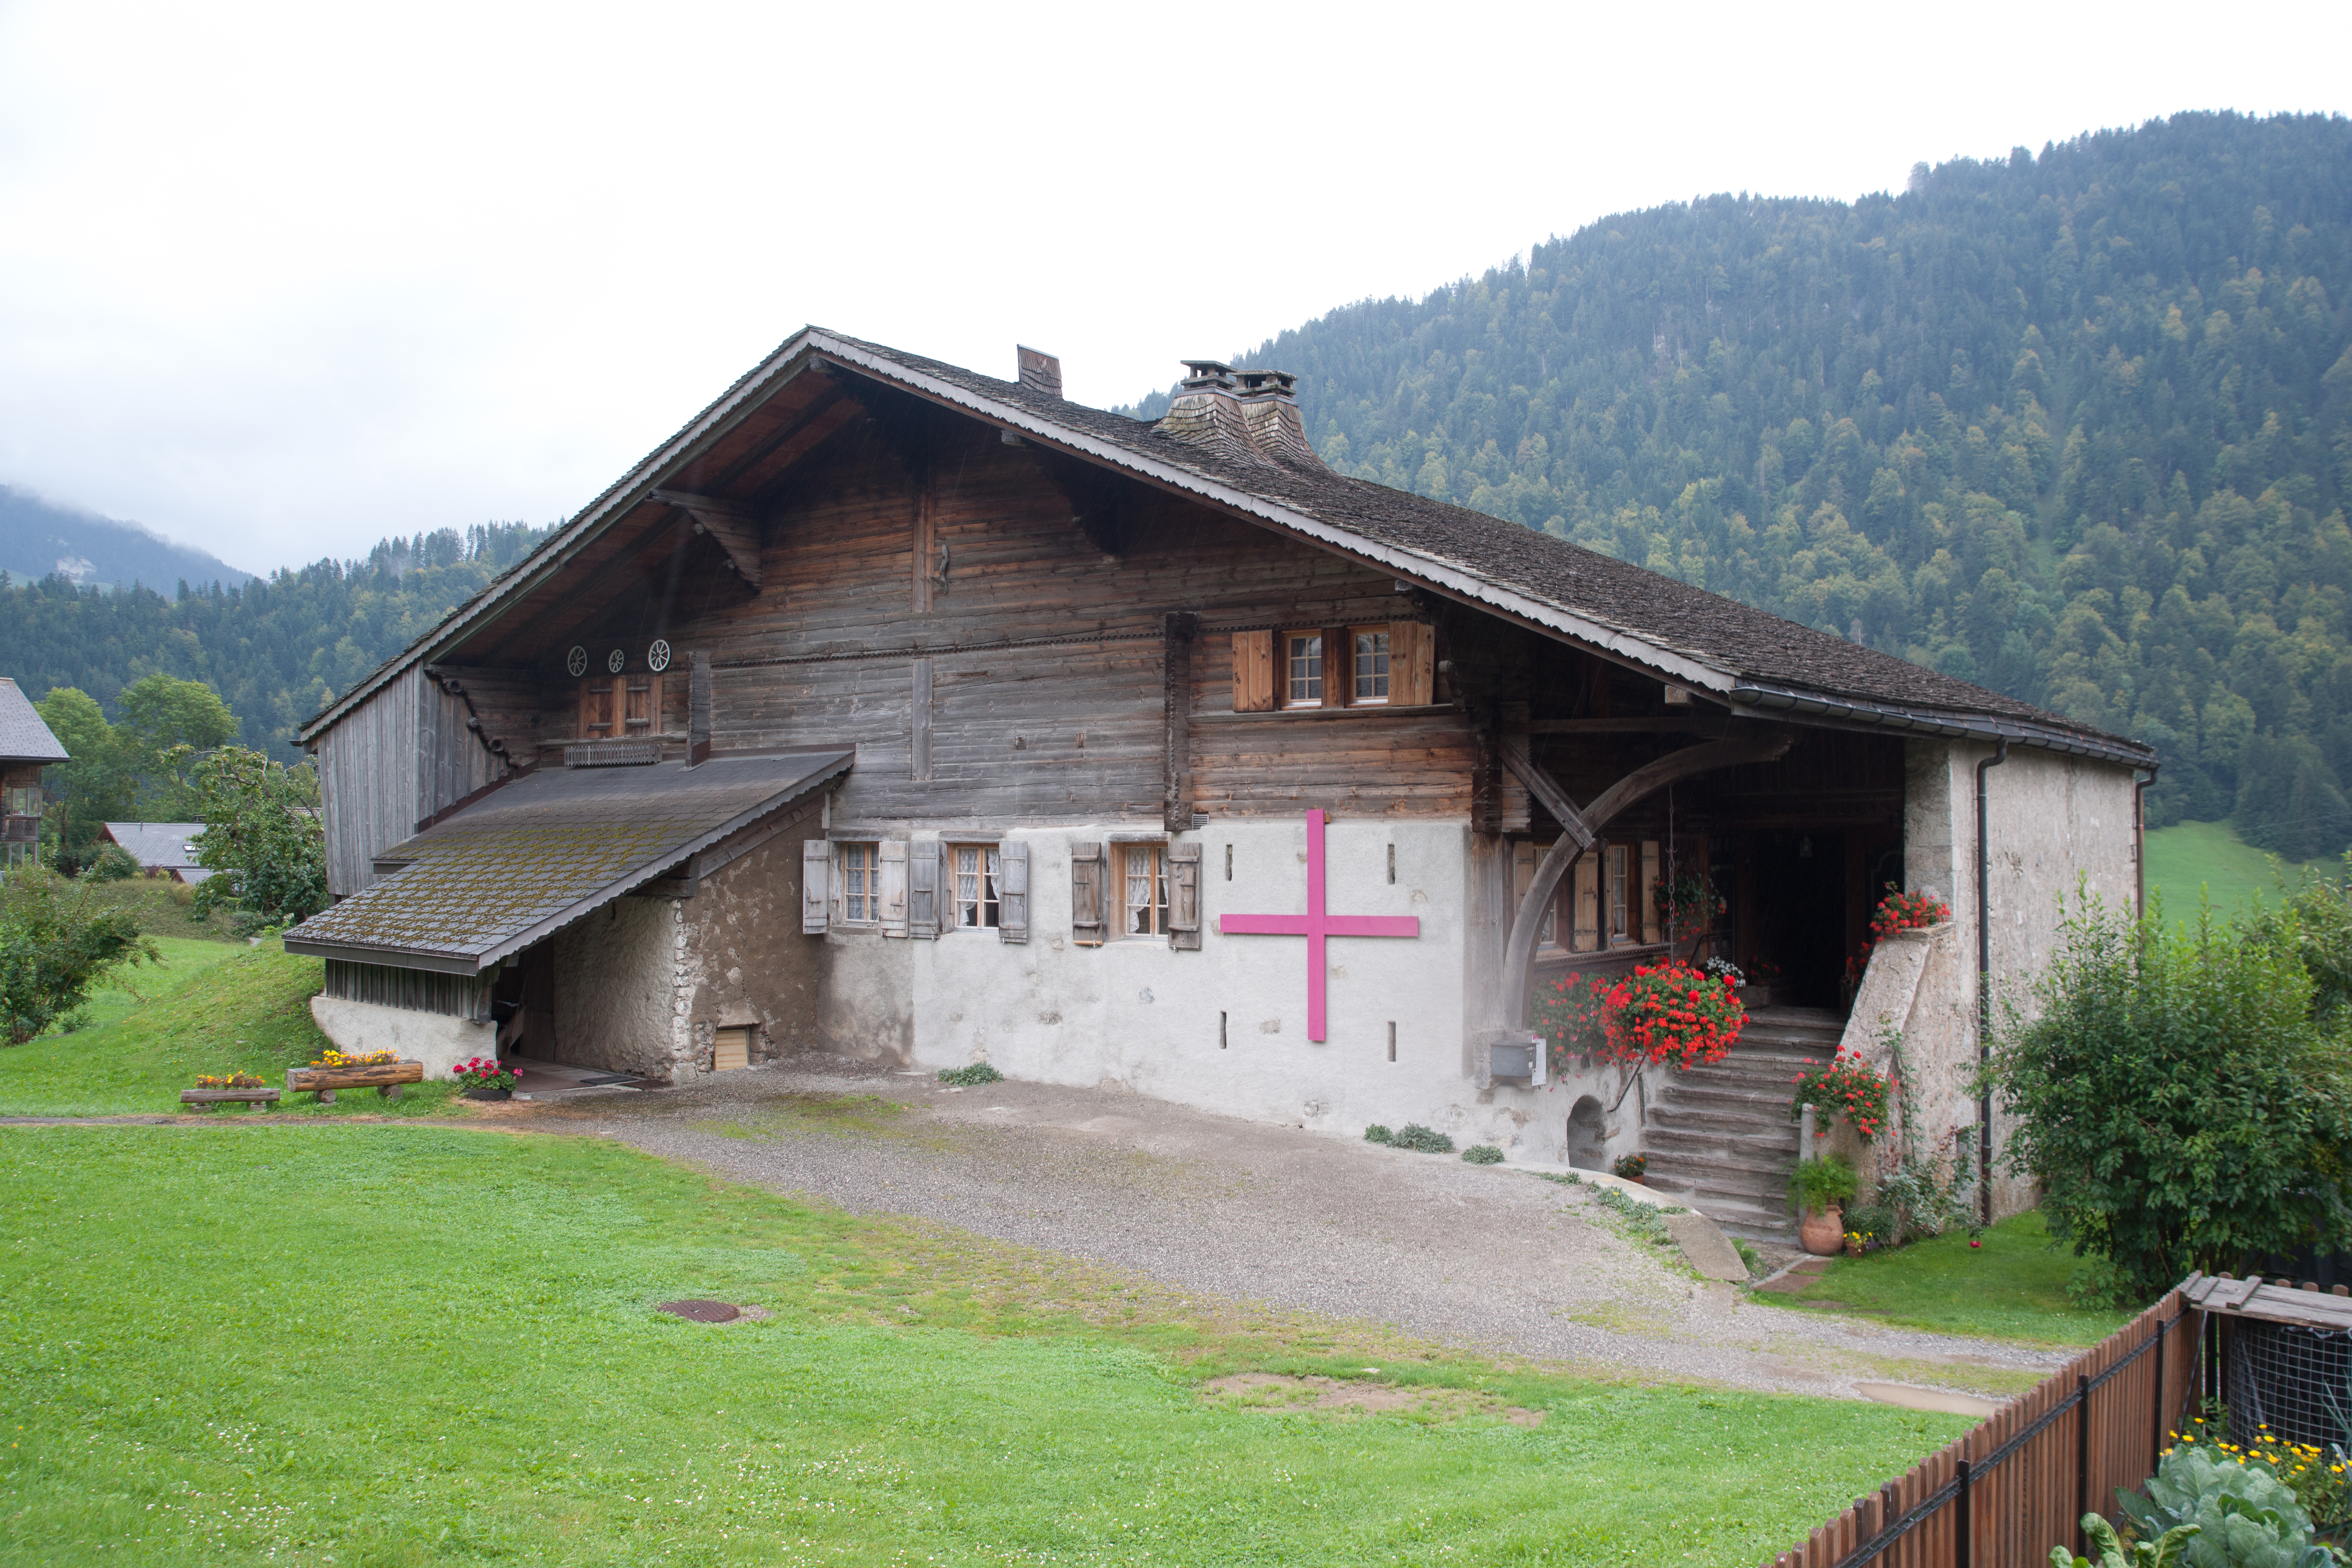 File rossini re maison de la wikimedia commons - La maison de la place saignon ...